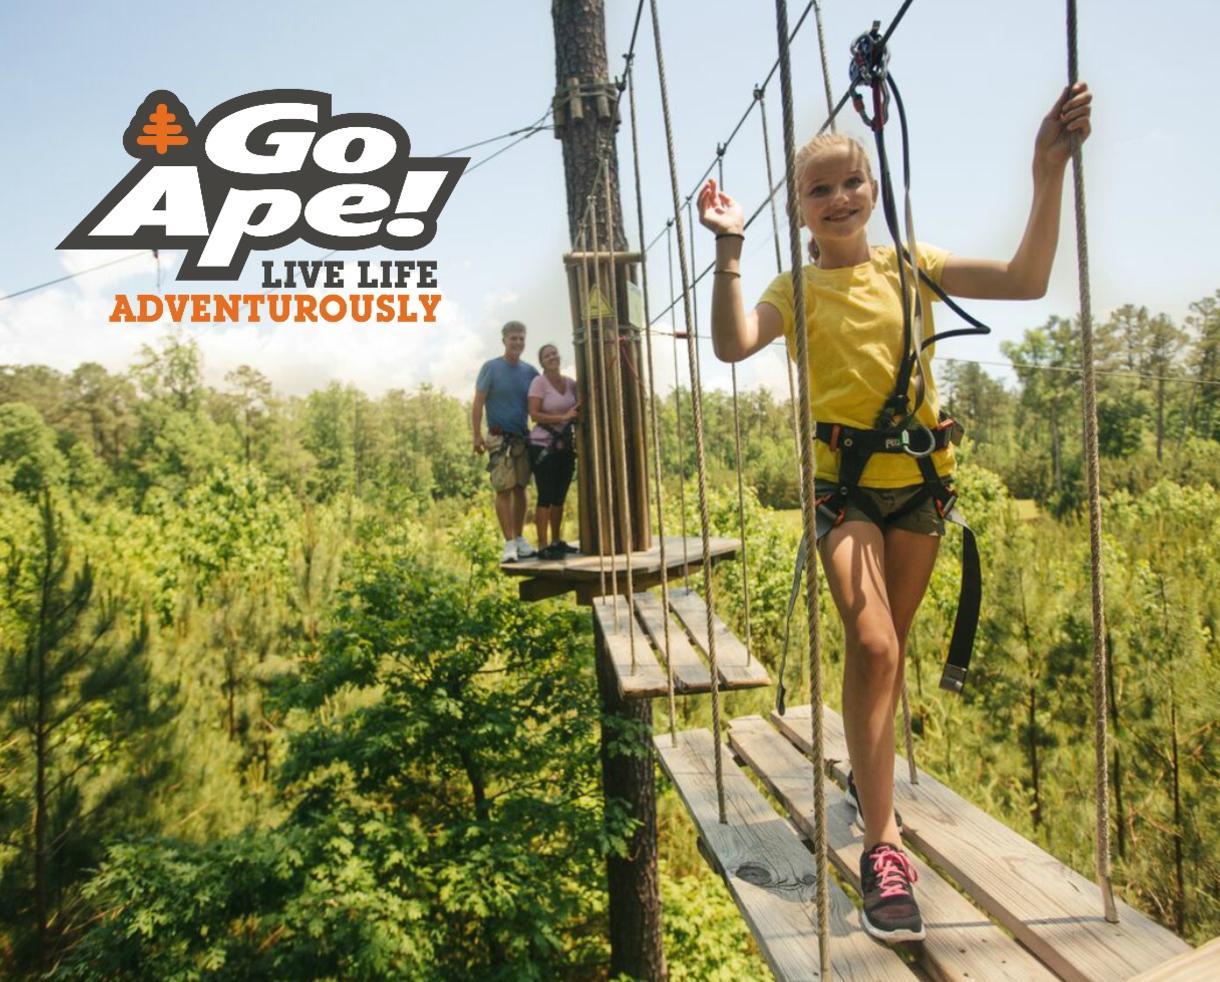 $23+ for Go Ape Treetop Junior or Treetop Adventure - BRAND NEW Springfield, VA Location + 11 Other U.S. Locations!